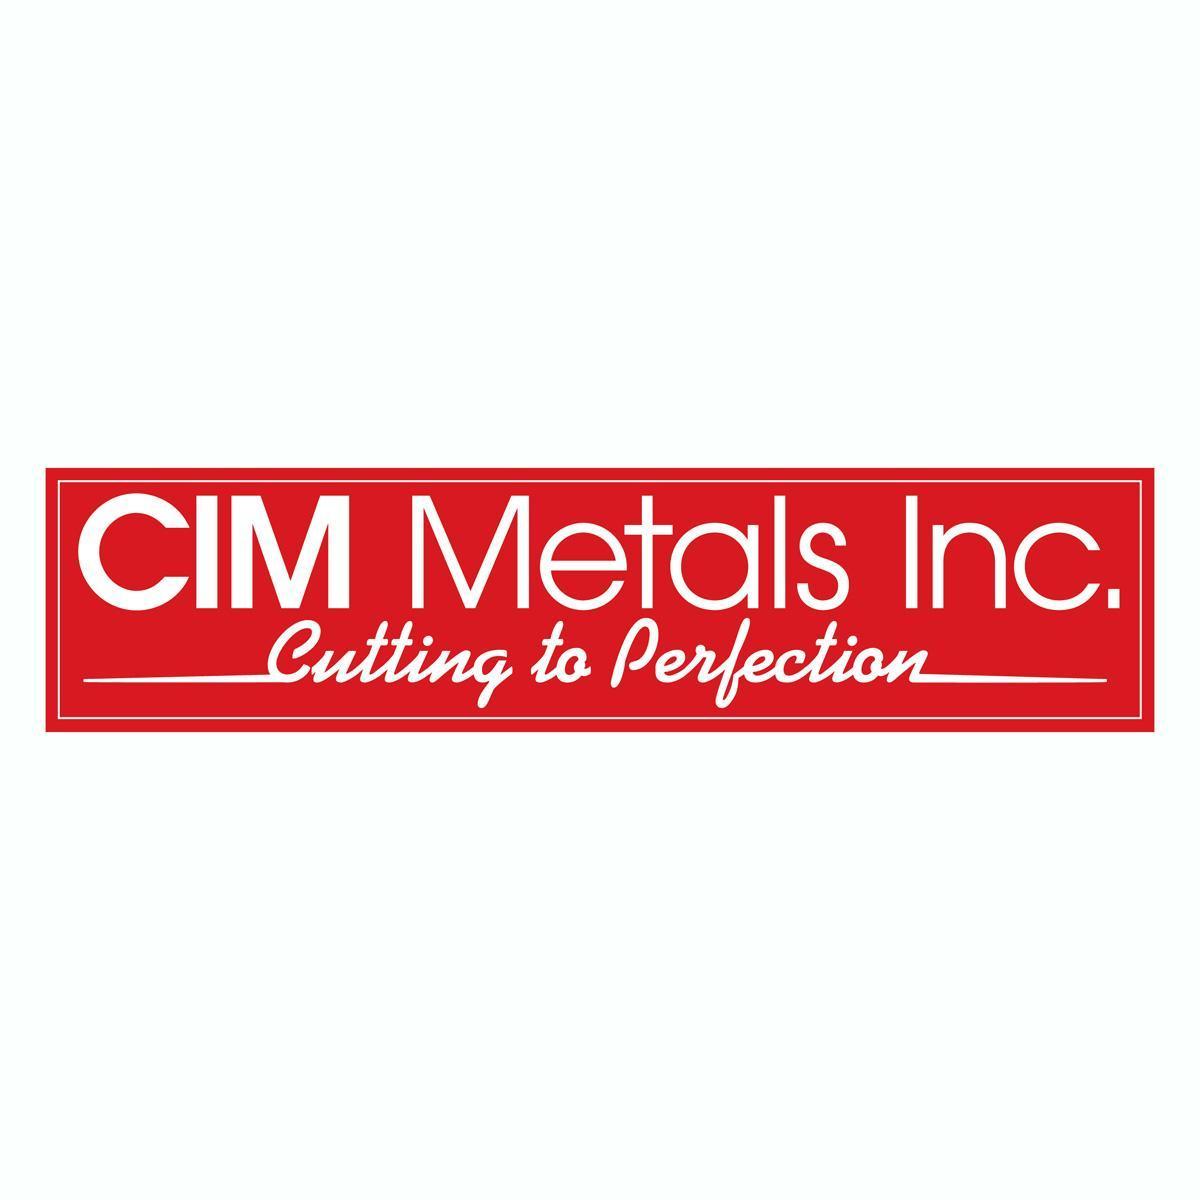 CIM Metals Inc